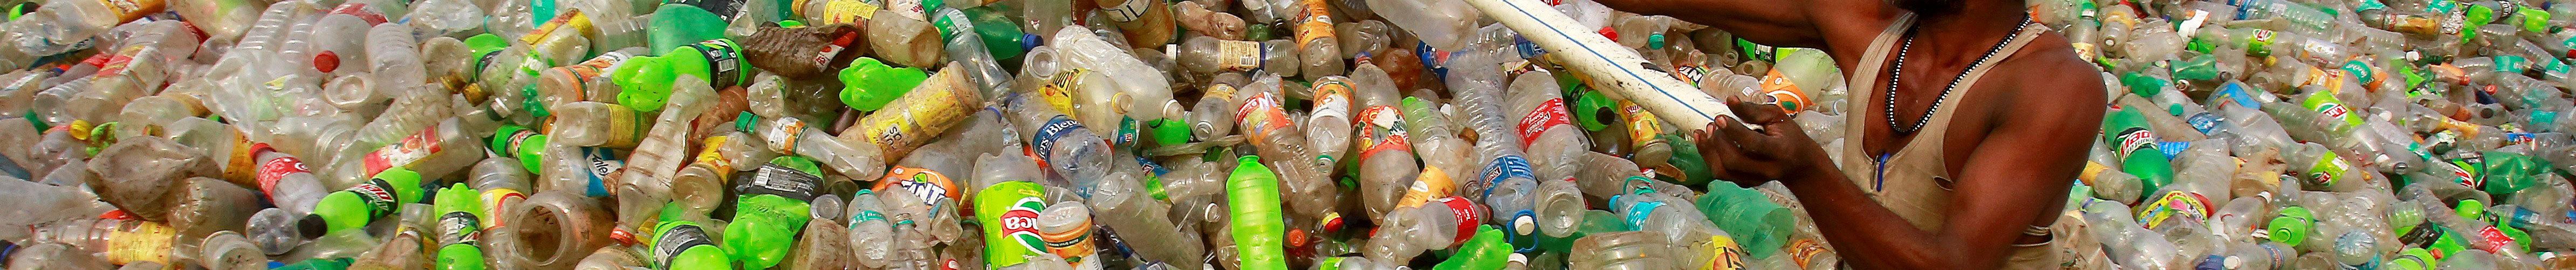 ASSEFa dice n alla plastica